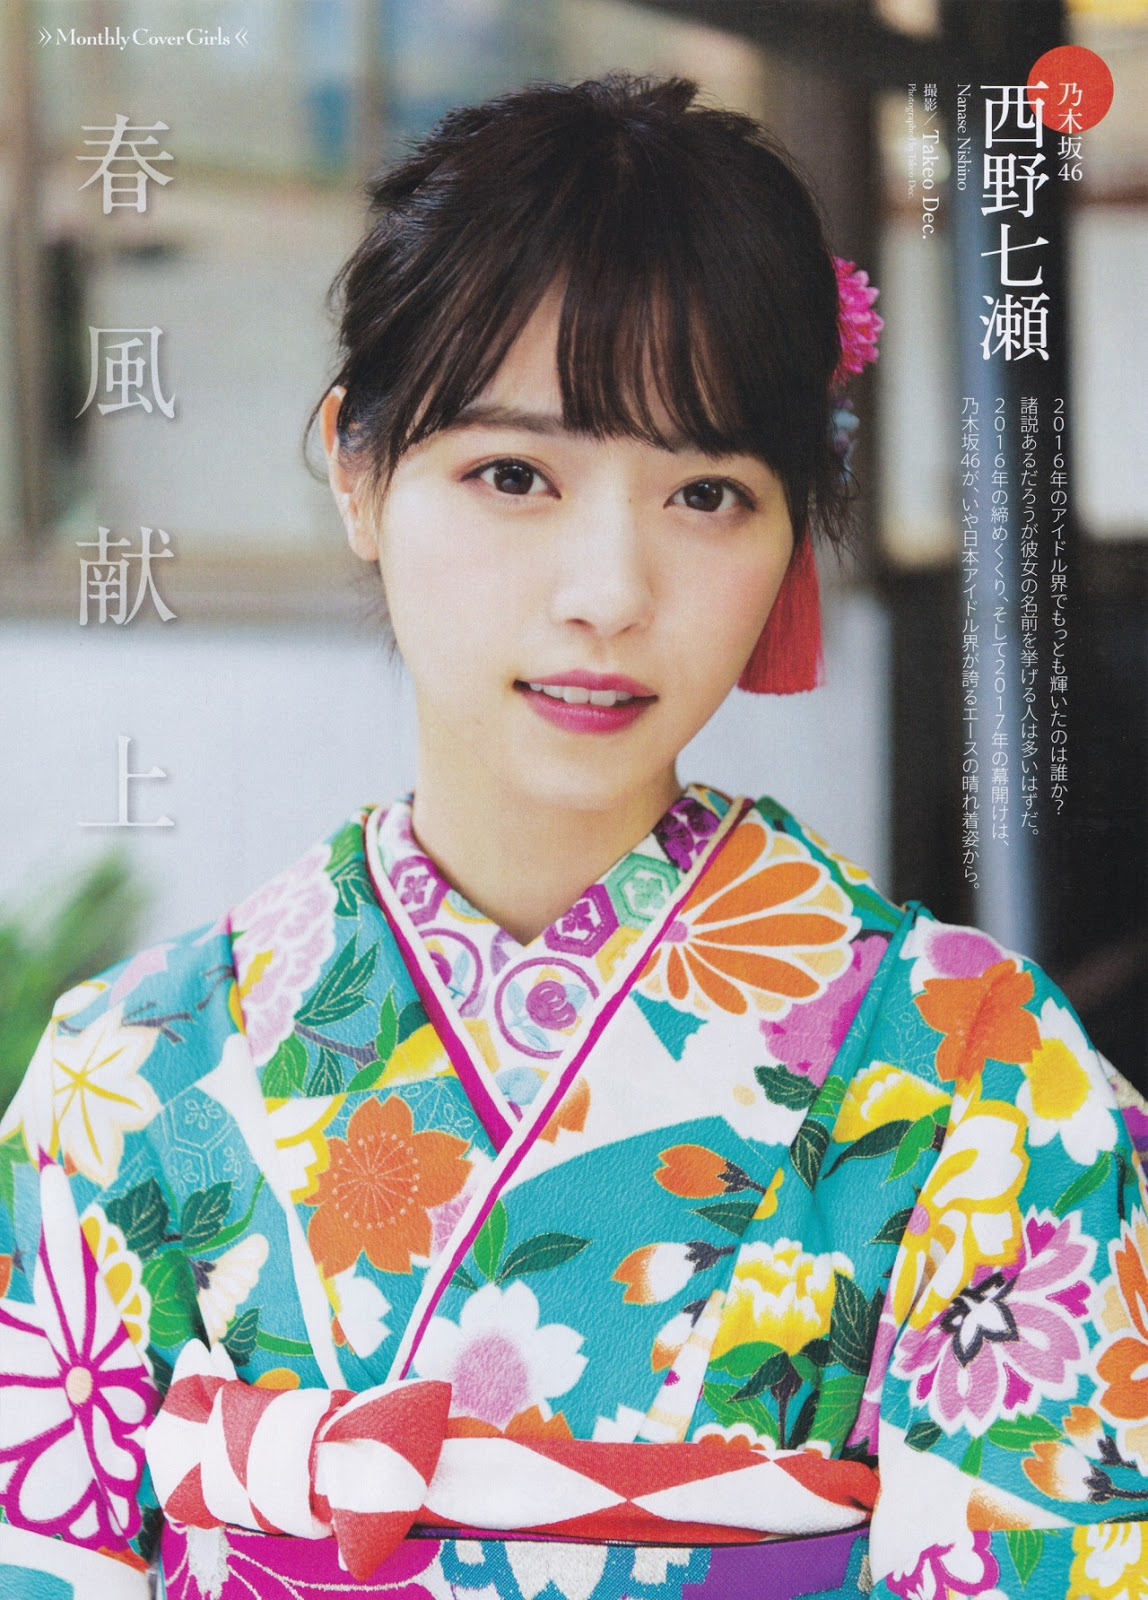 Nishino Nanase 西野七瀬 Nogizaka46, ENTAME 2017.02 (月刊エンタメ 2017年2月号)